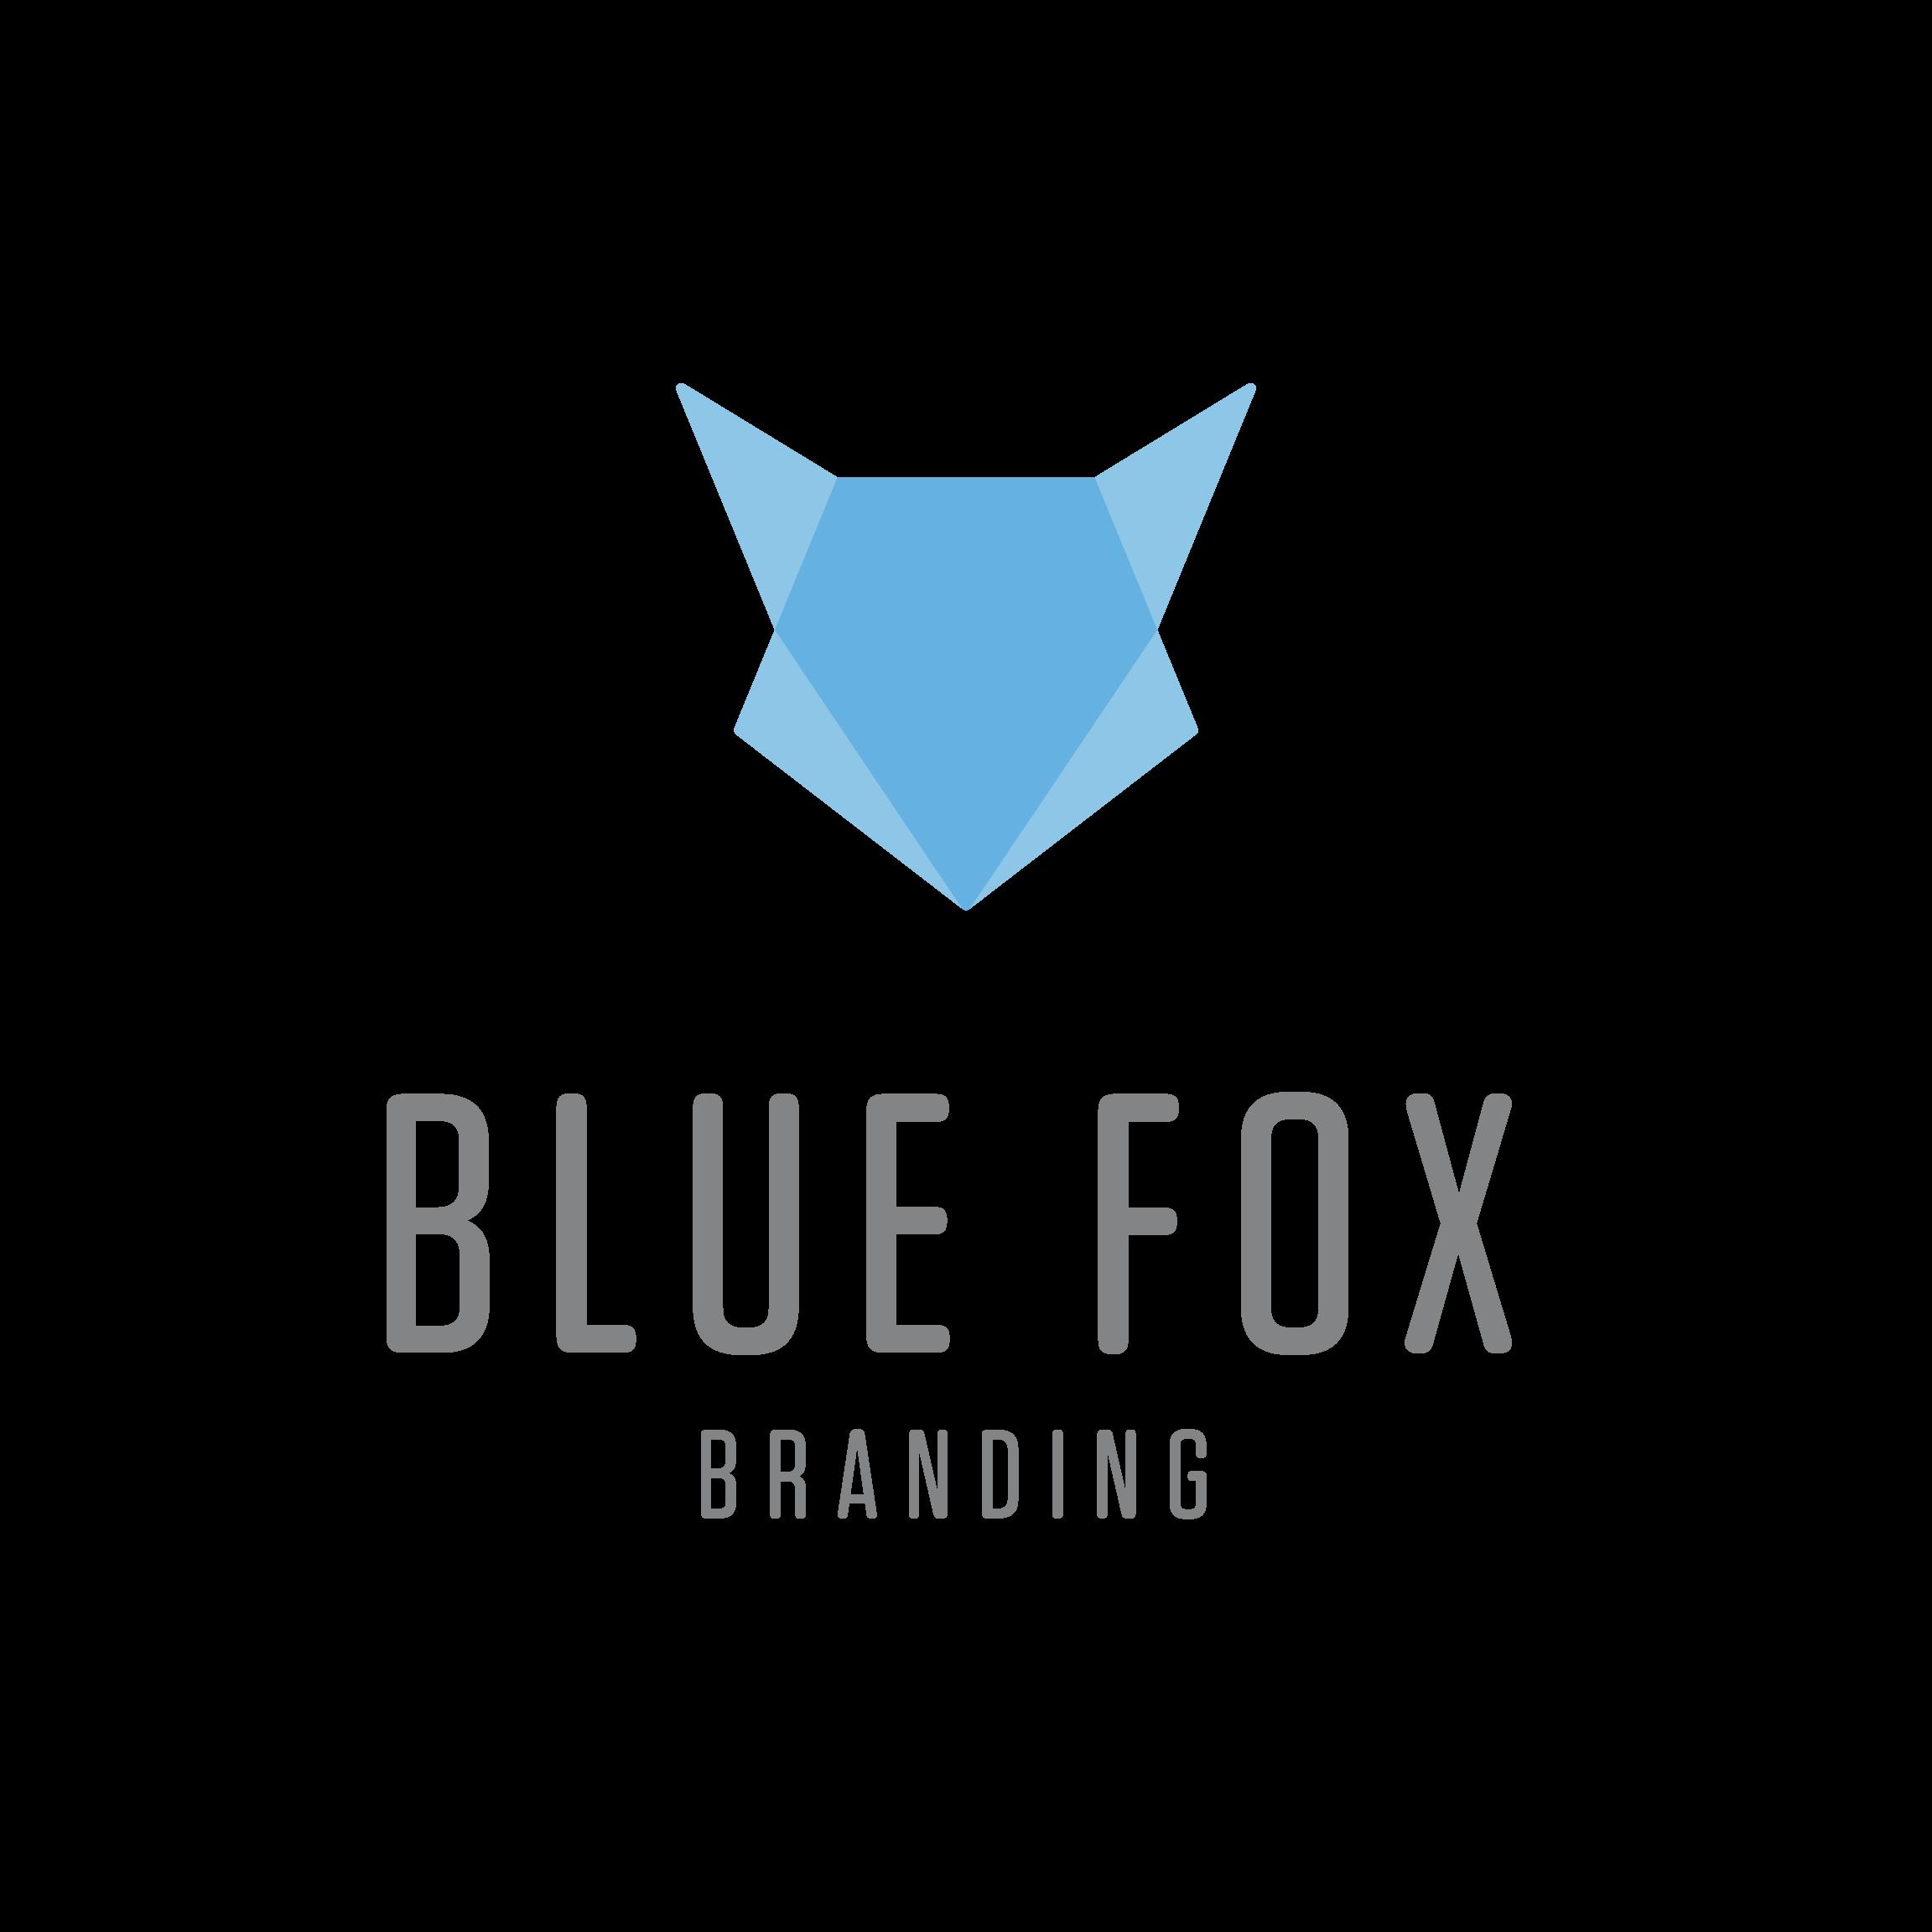 Blue Fox Branding